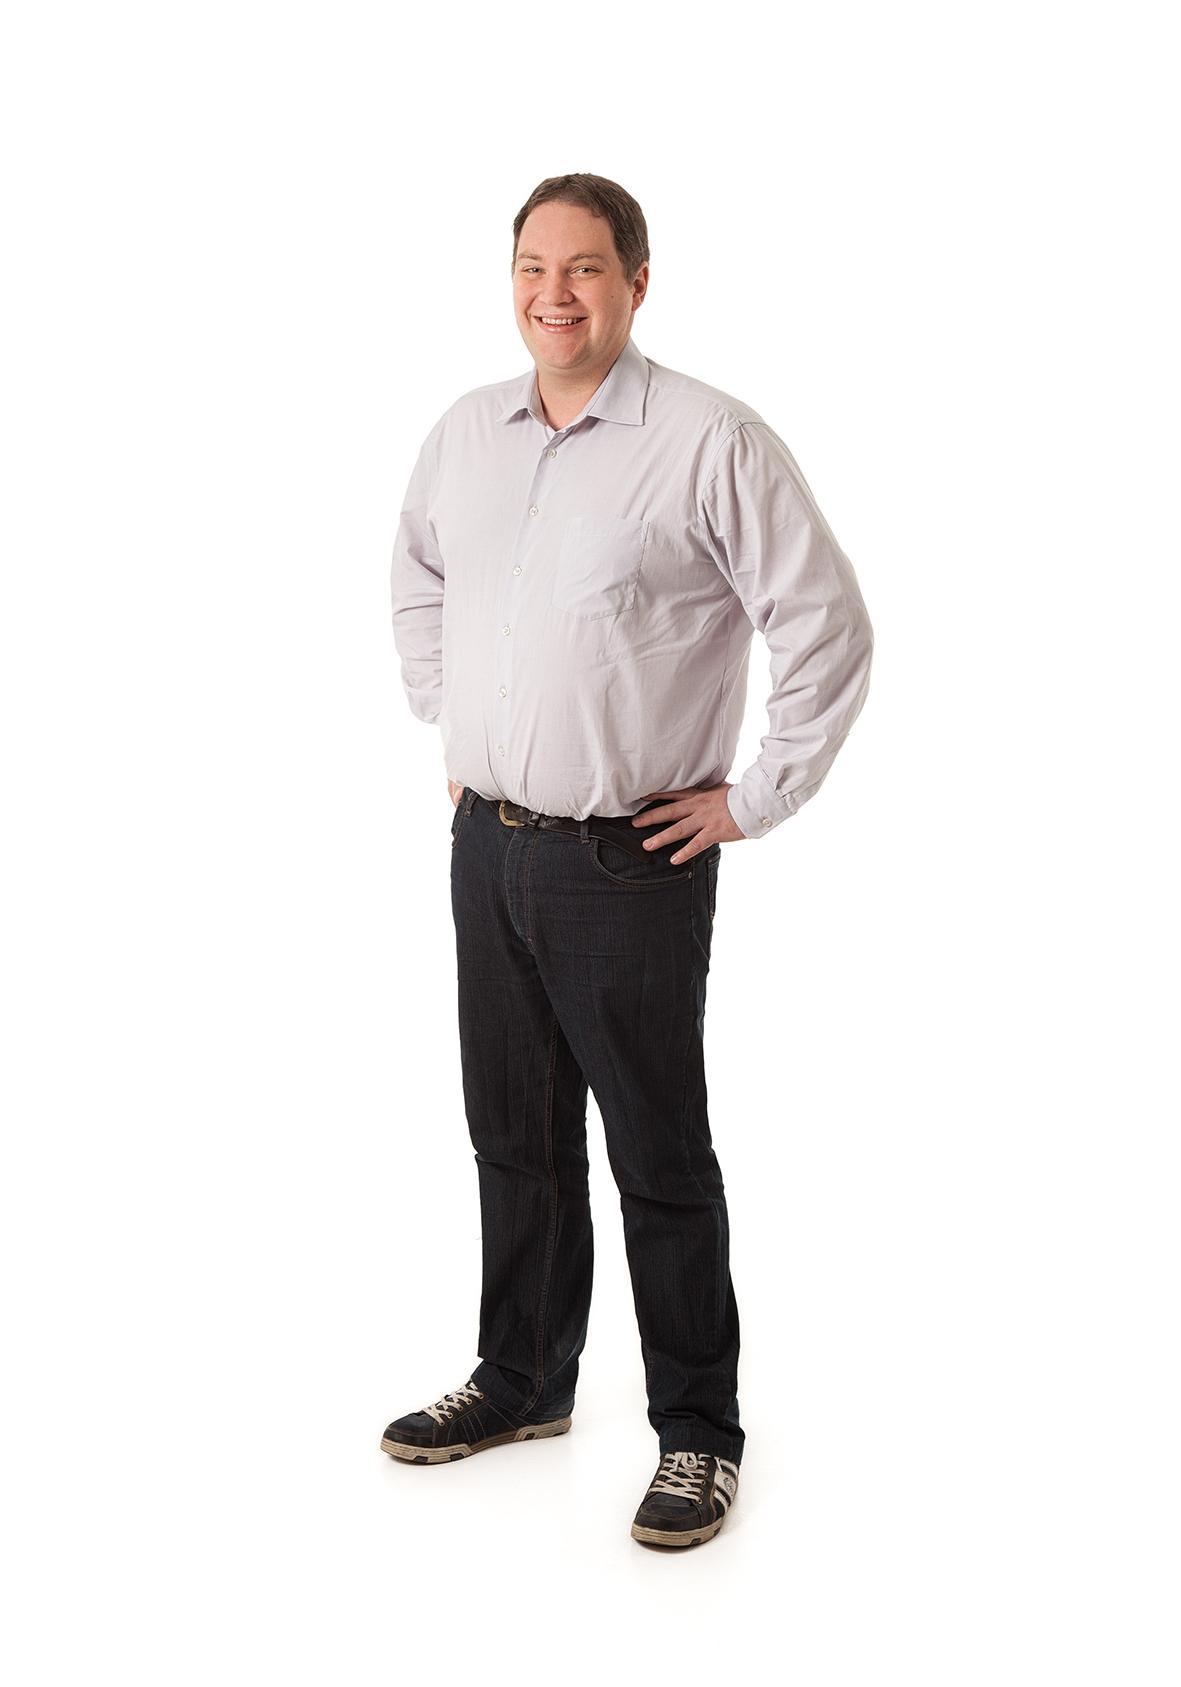 Pascal Vanderpypen